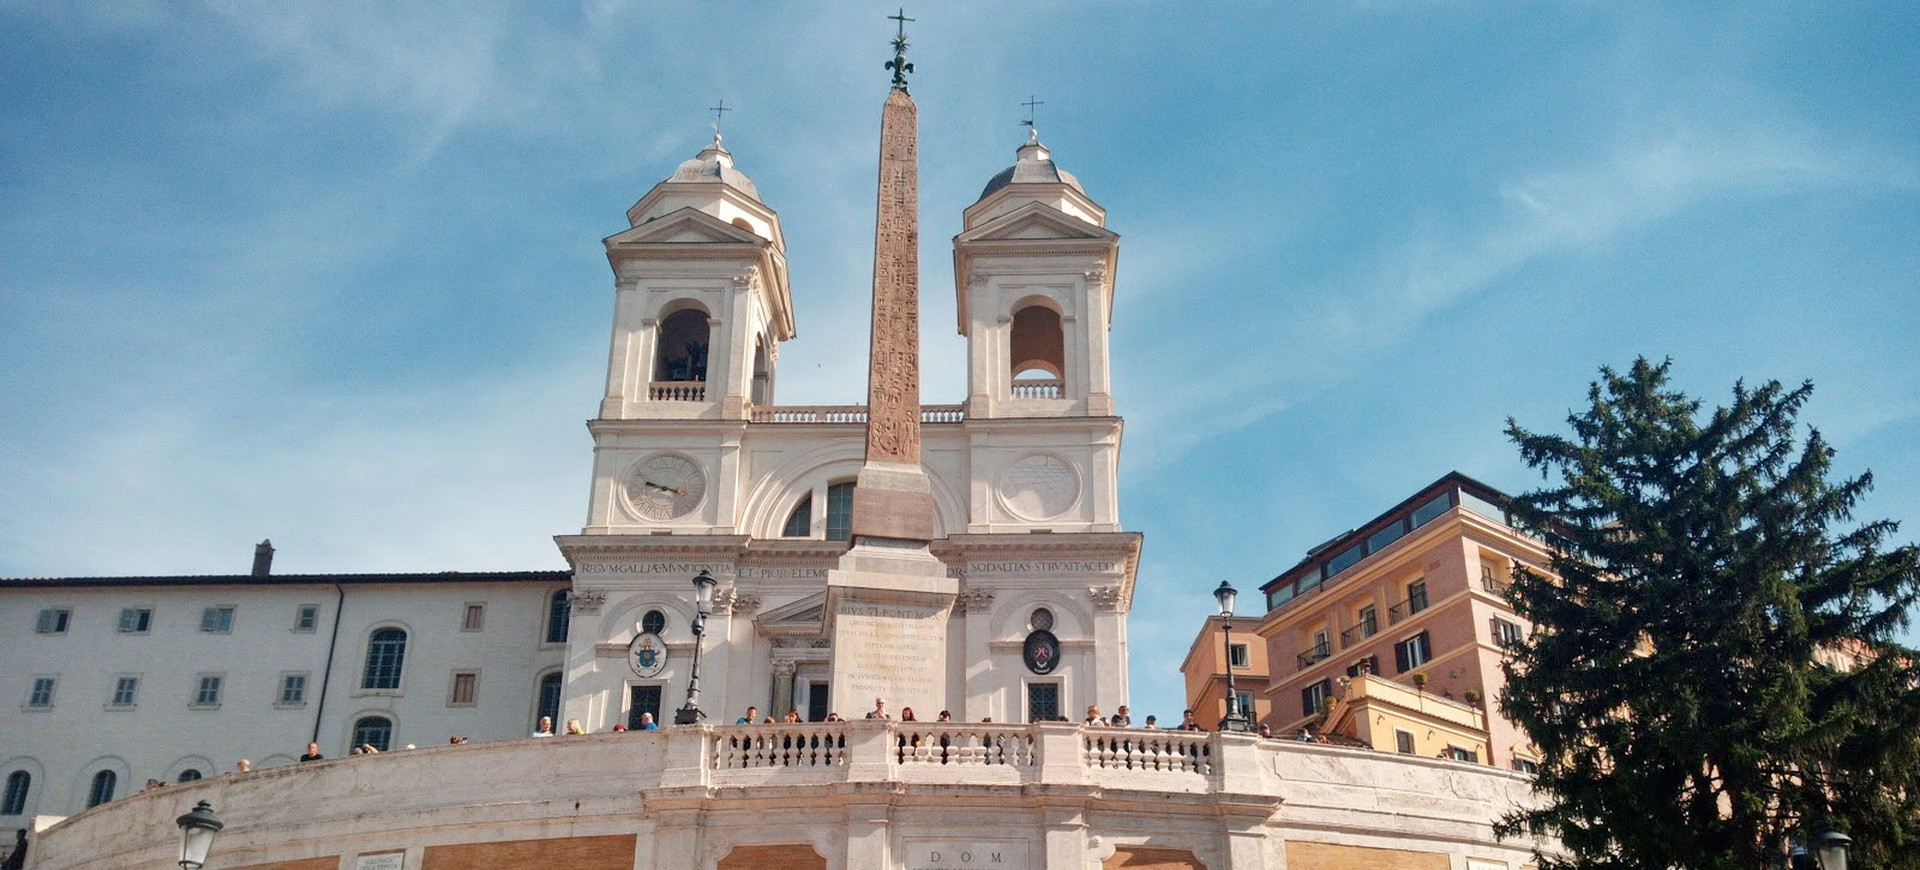 Italie Rome Trinité dei Monti